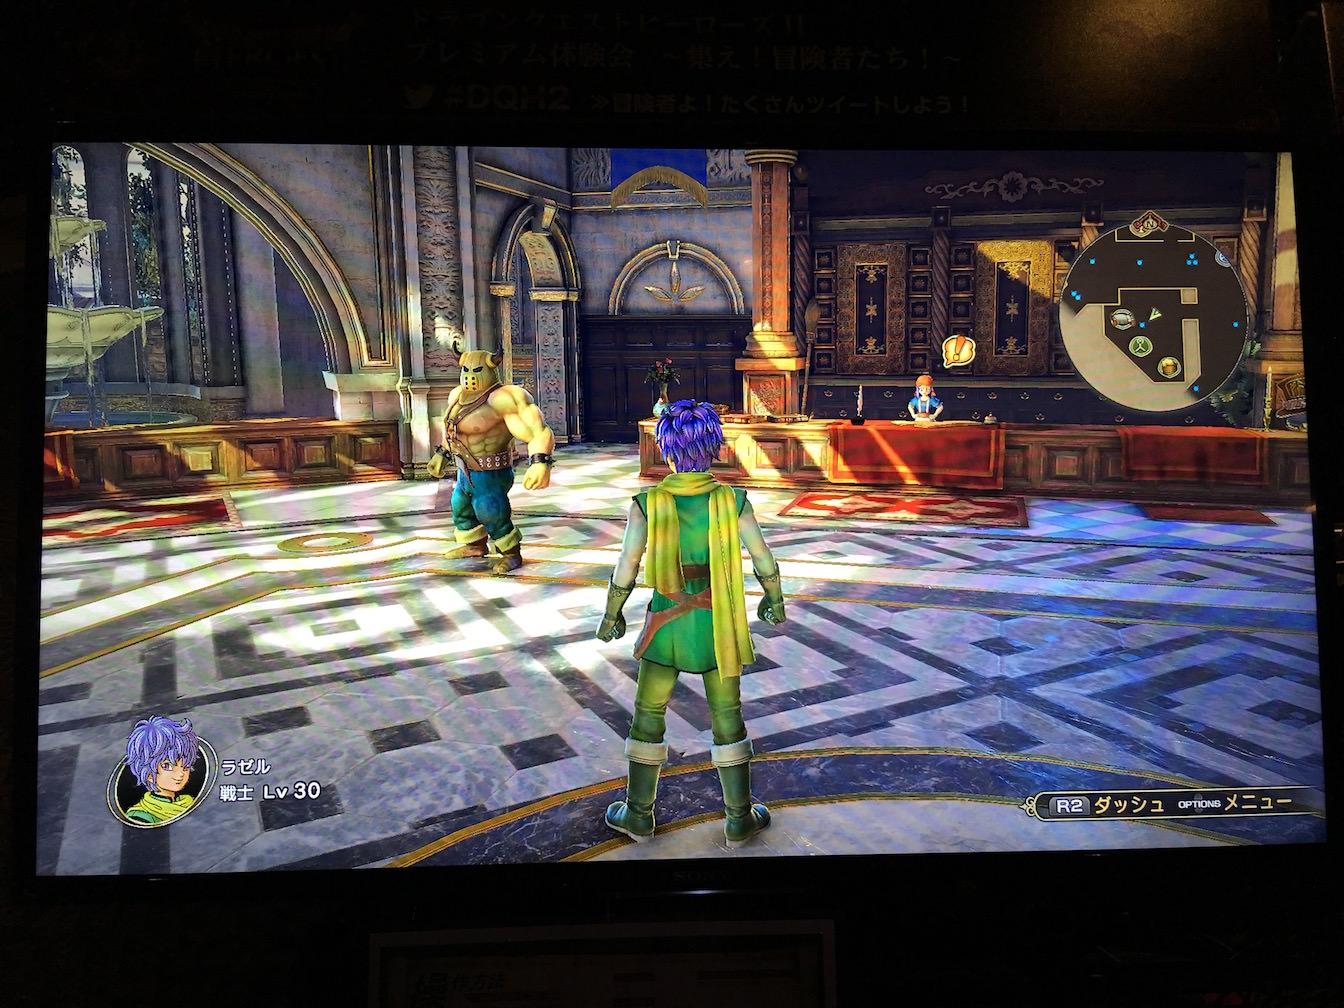 Dragon quest heros 2 premium experience meeting report 28